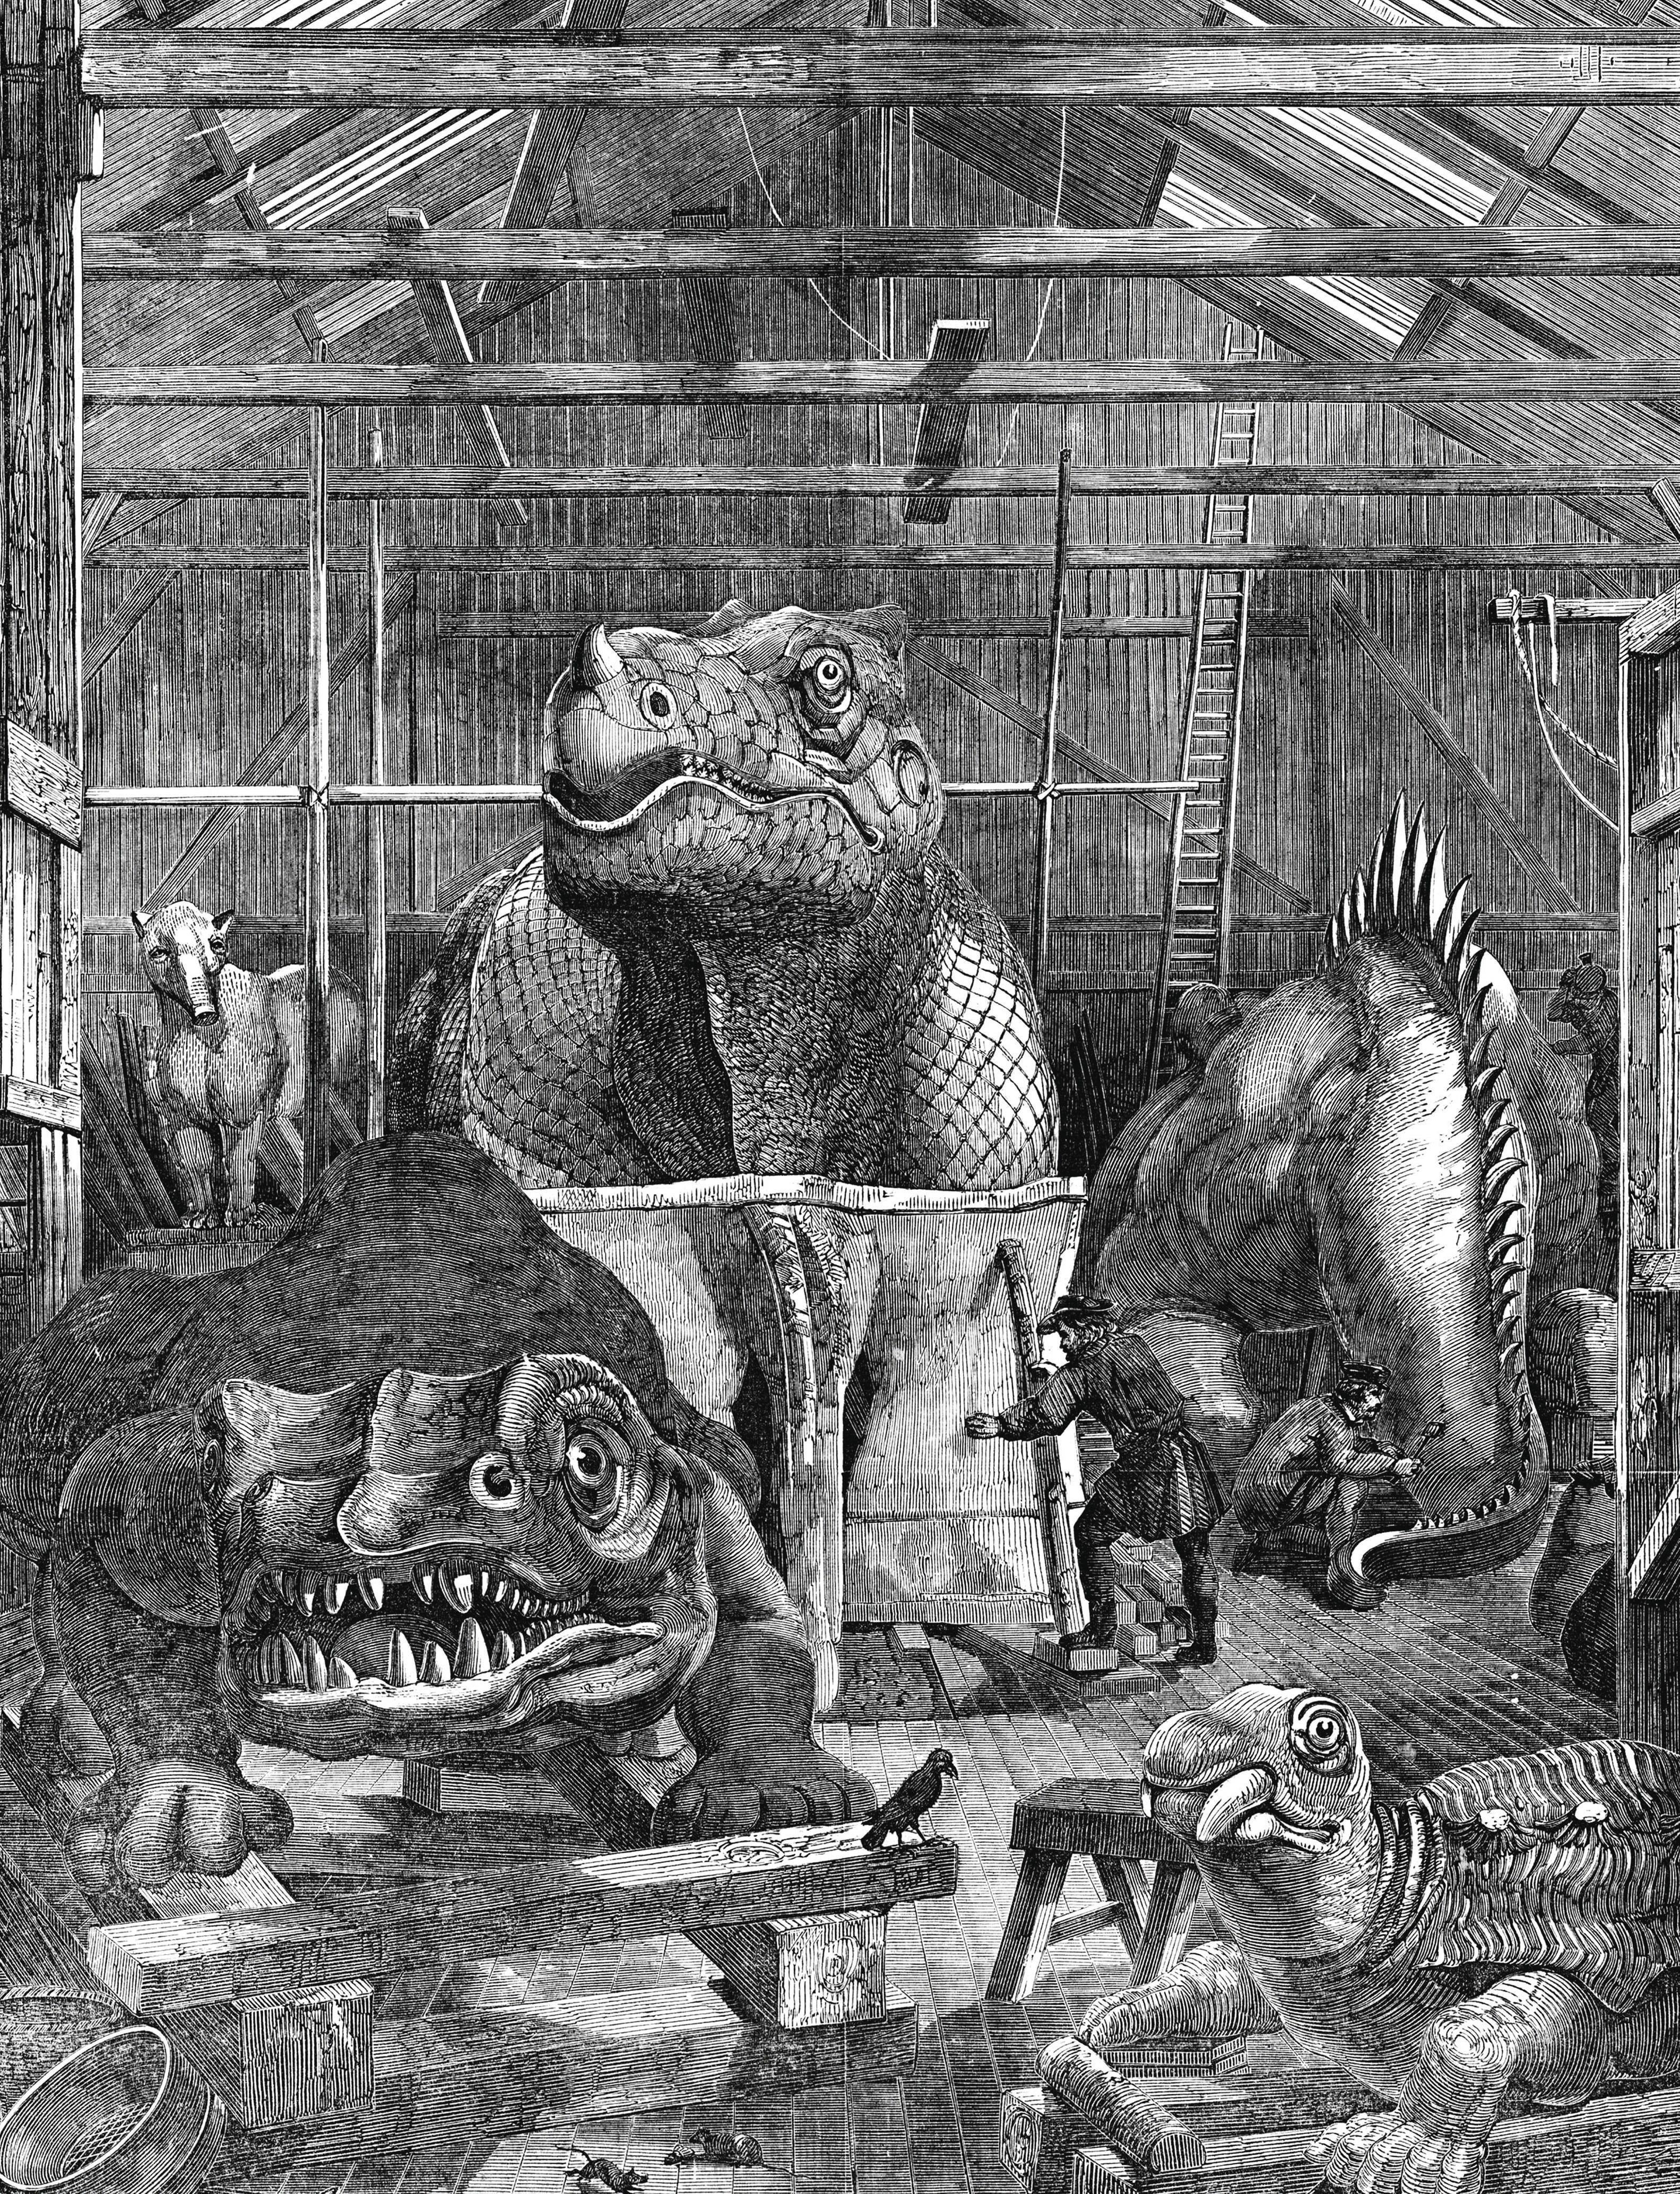 Paleoart: the strange history of dinosaurs in art – in pictures #historyofdinosaurs Paleoart: the strange history of dinosaurs in art – in pictures #historyofdinosaurs Paleoart: the strange history of dinosaurs in art – in pictures #historyofdinosaurs Paleoart: the strange history of dinosaurs in art – in pictures #historyofdinosaurs Paleoart: the strange history of dinosaurs in art – in pictures #historyofdinosaurs Paleoart: the strange history of dinosaurs in art – in pictures #his #historyofdinosaurs